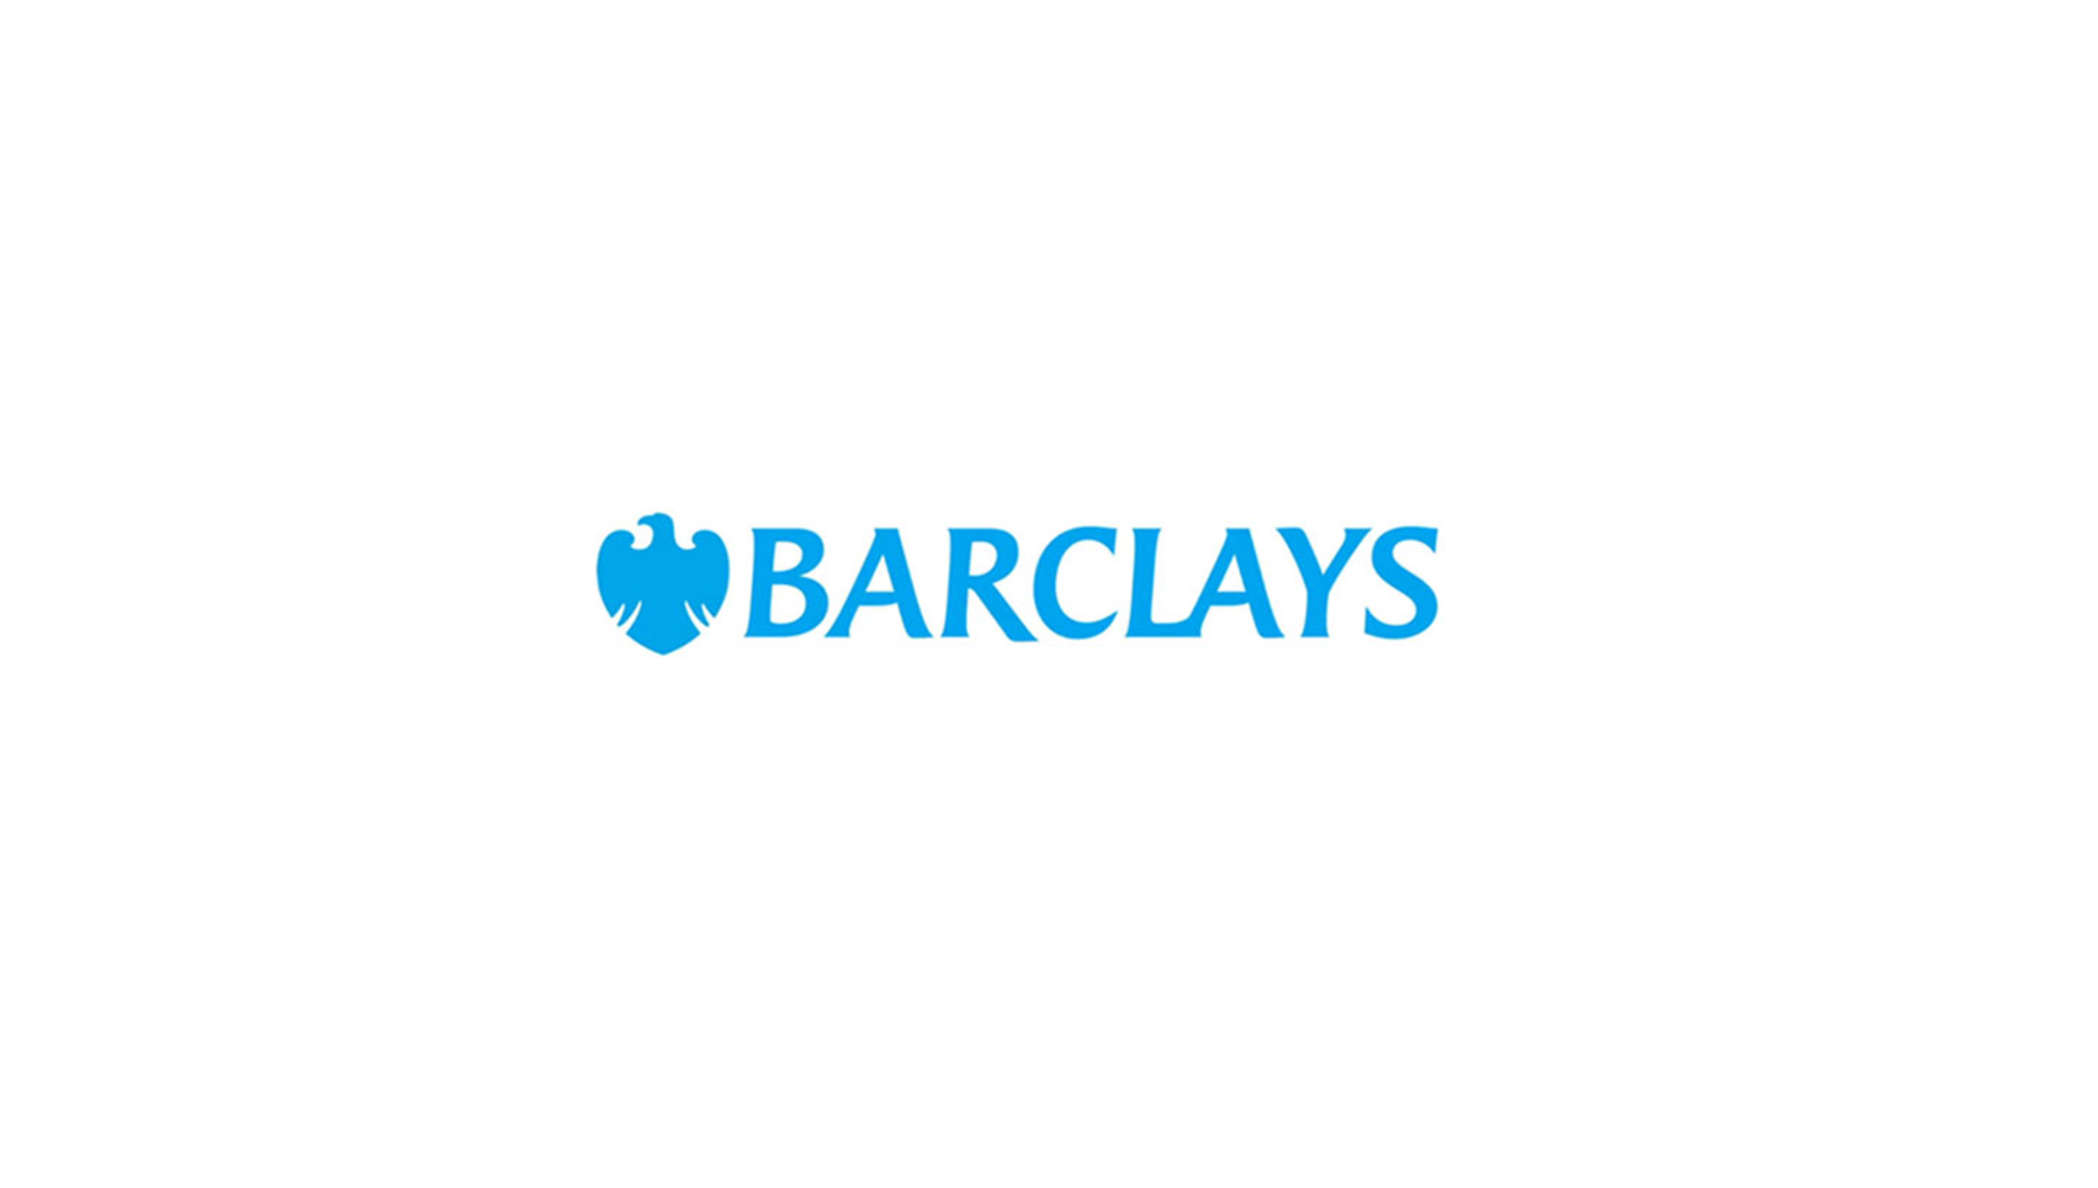 Barclays banking